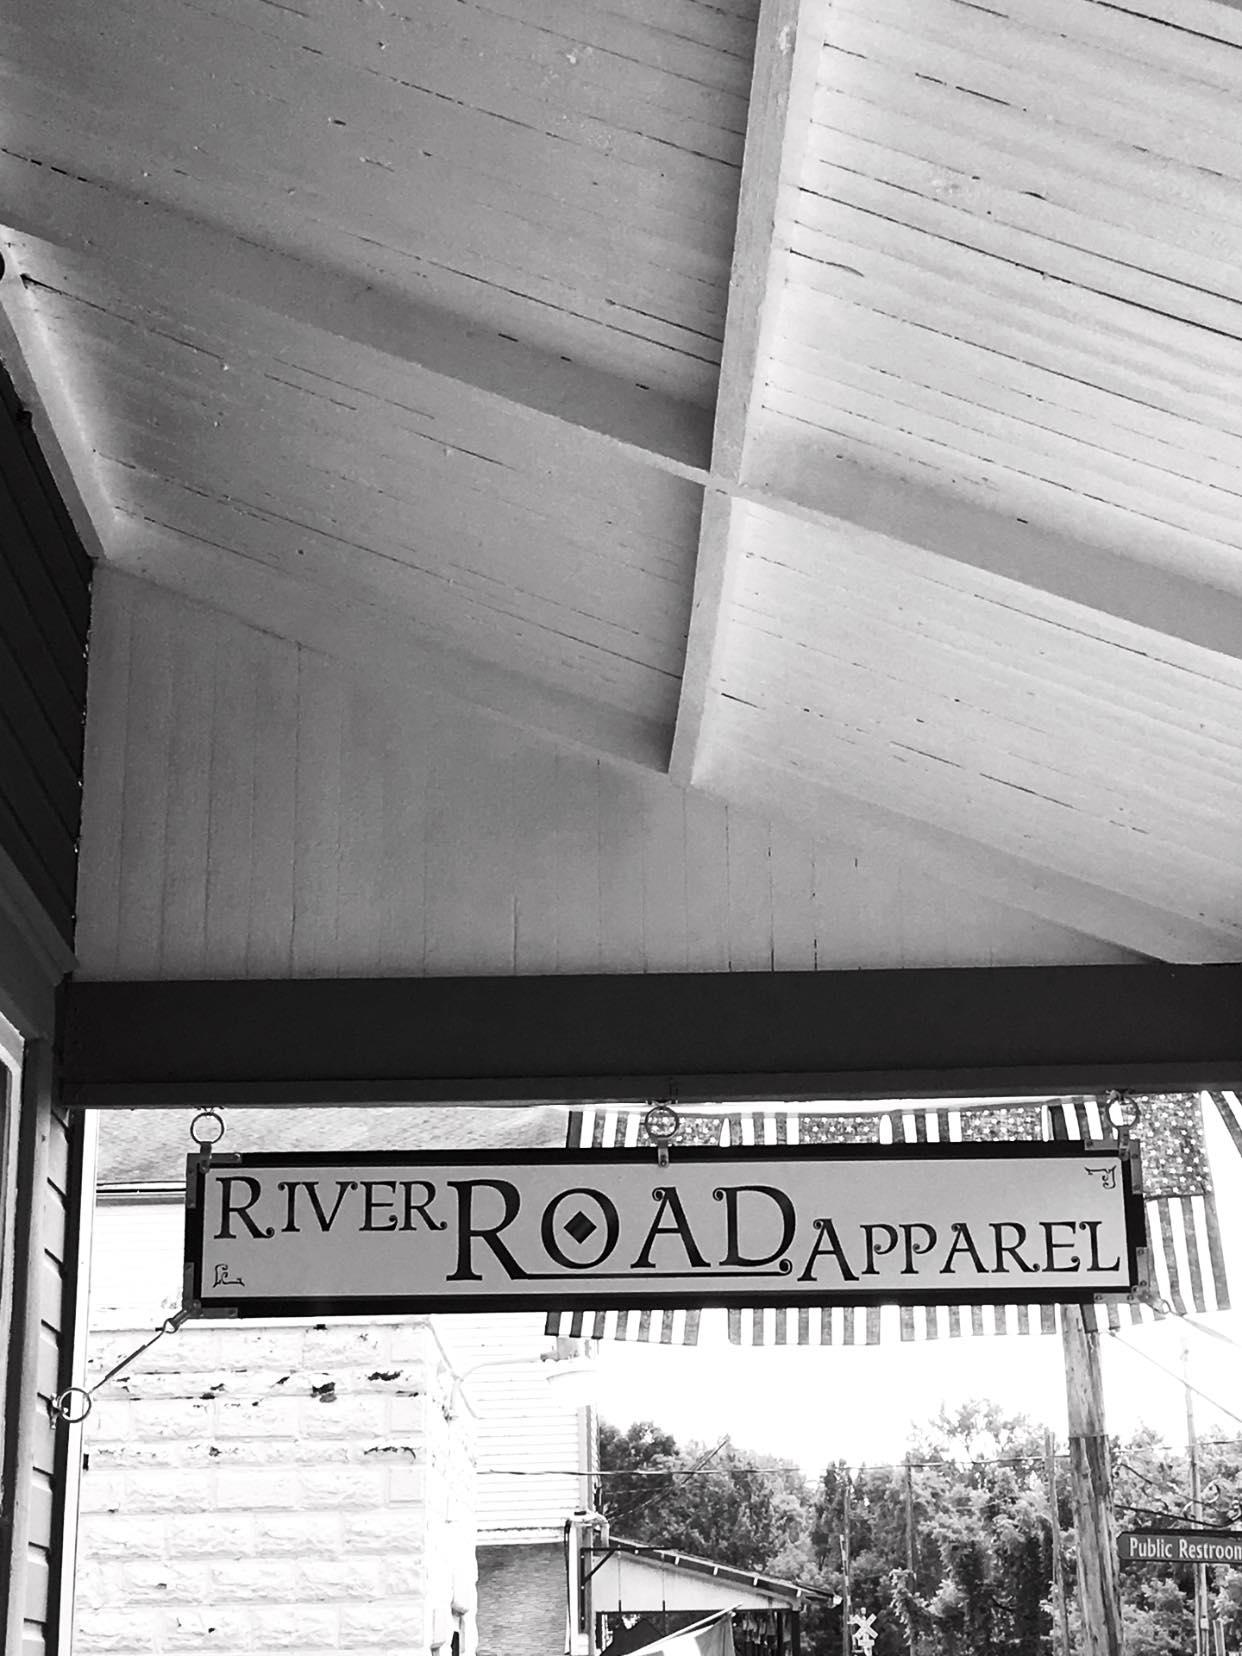 Juno River Road Apparel